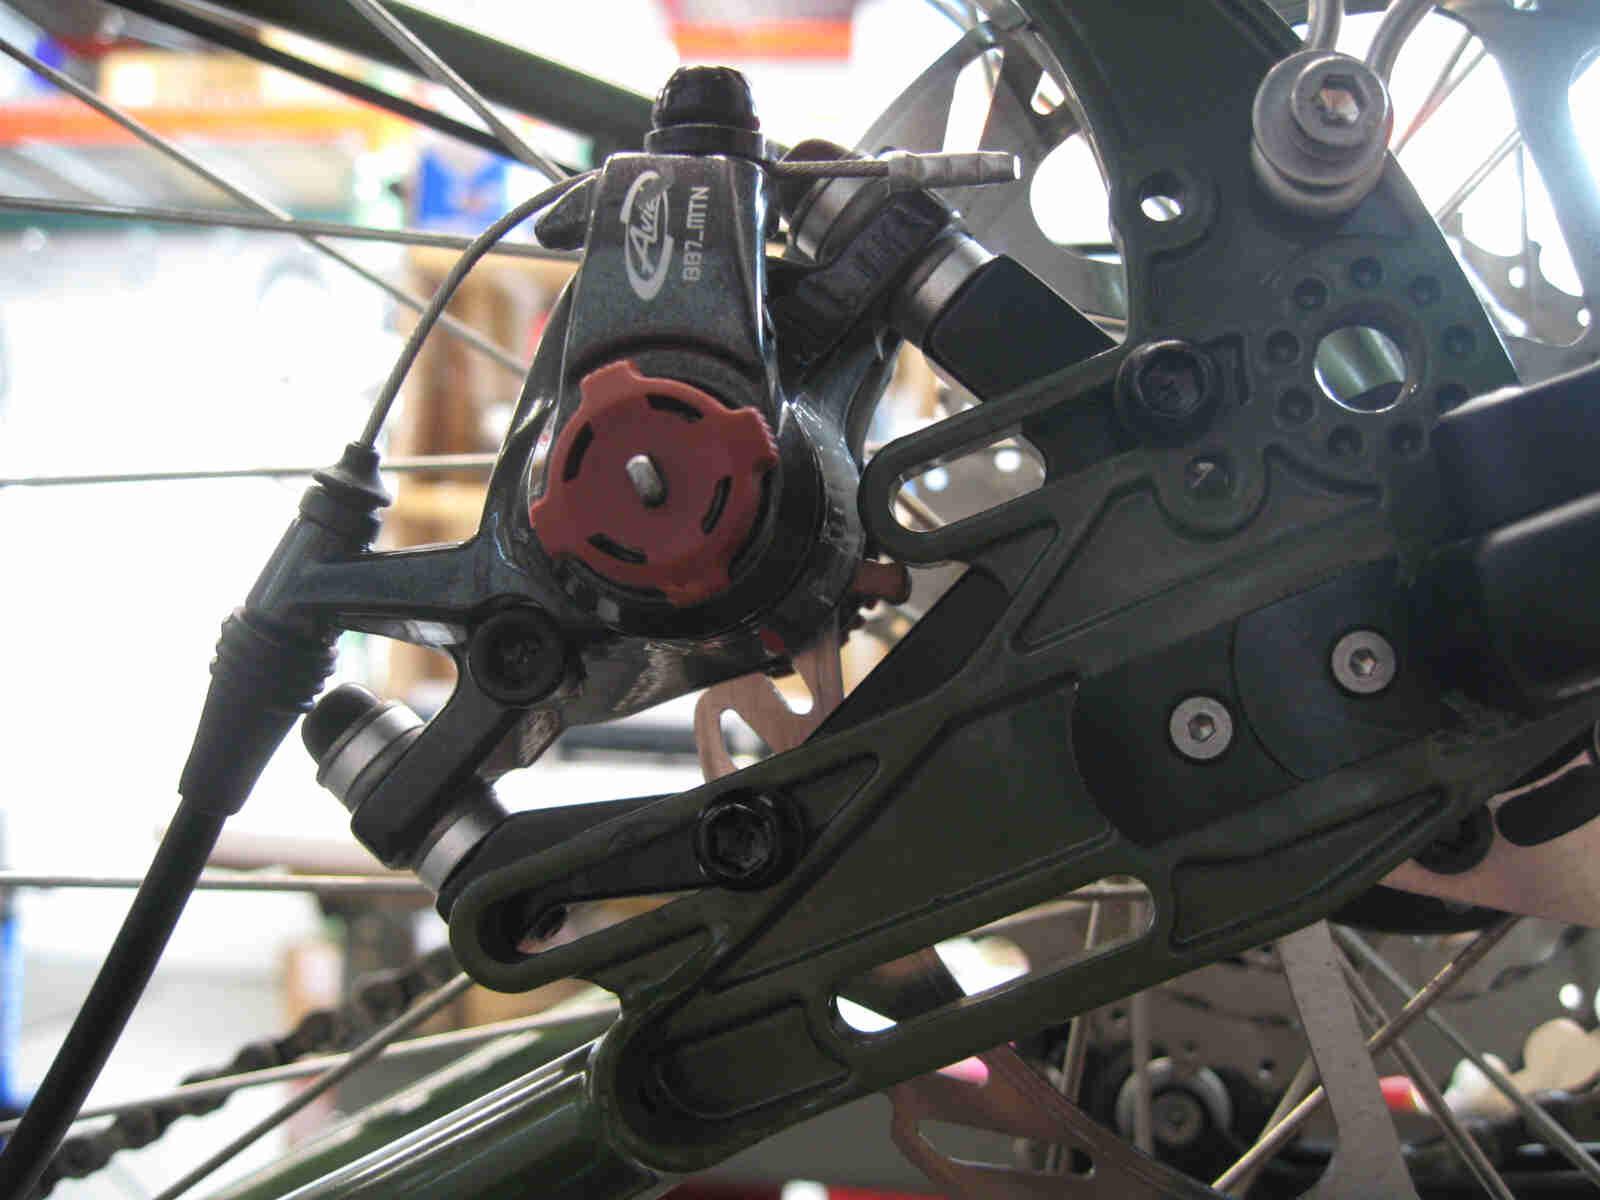 Surly Ogre bike - green - rear disc brake caliper detail - left side, close up view